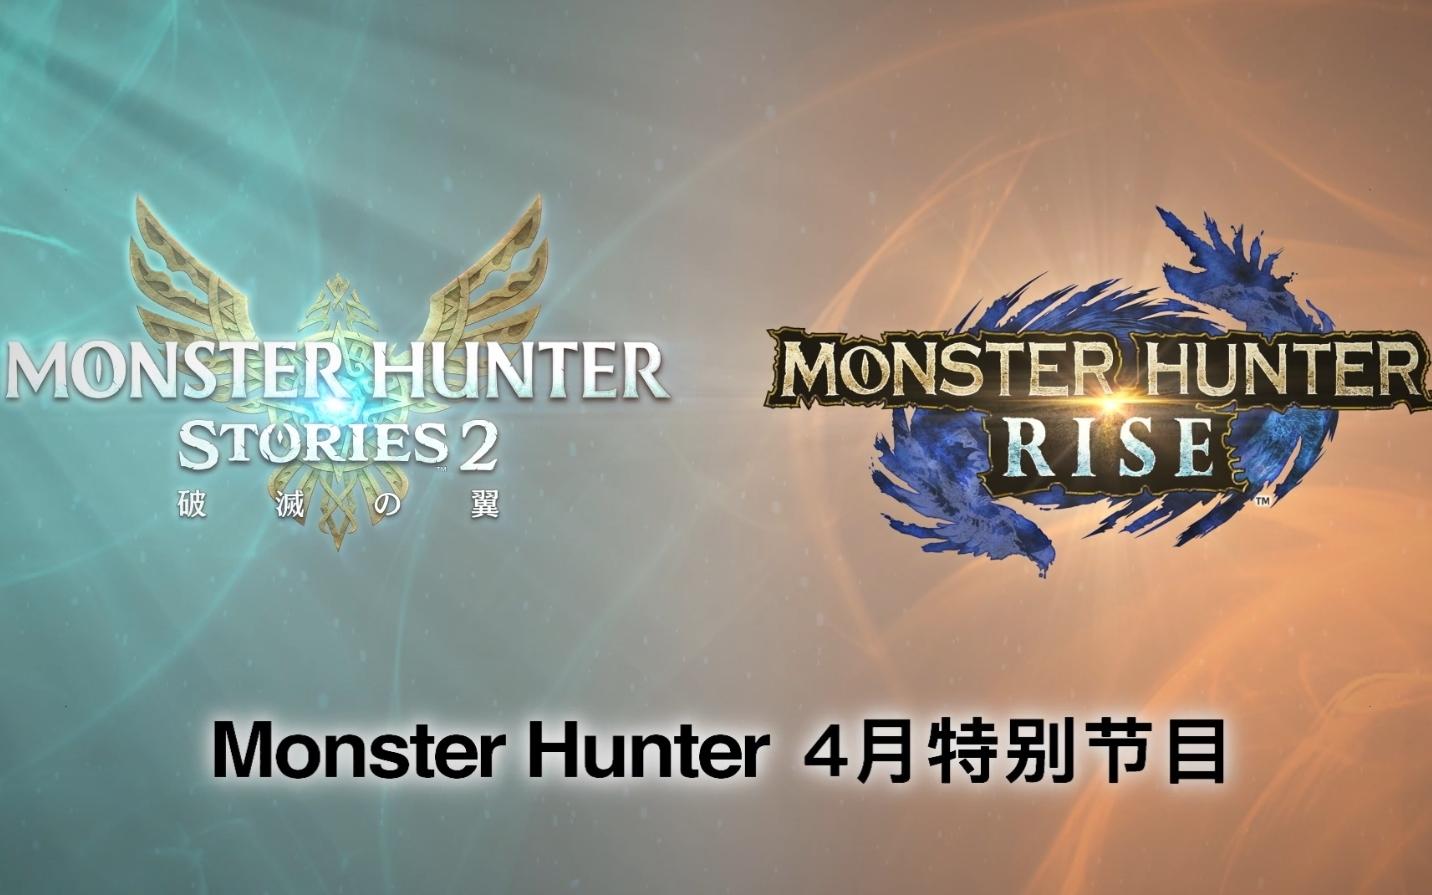 """Monster Hunter 4月特别节目""公开!"